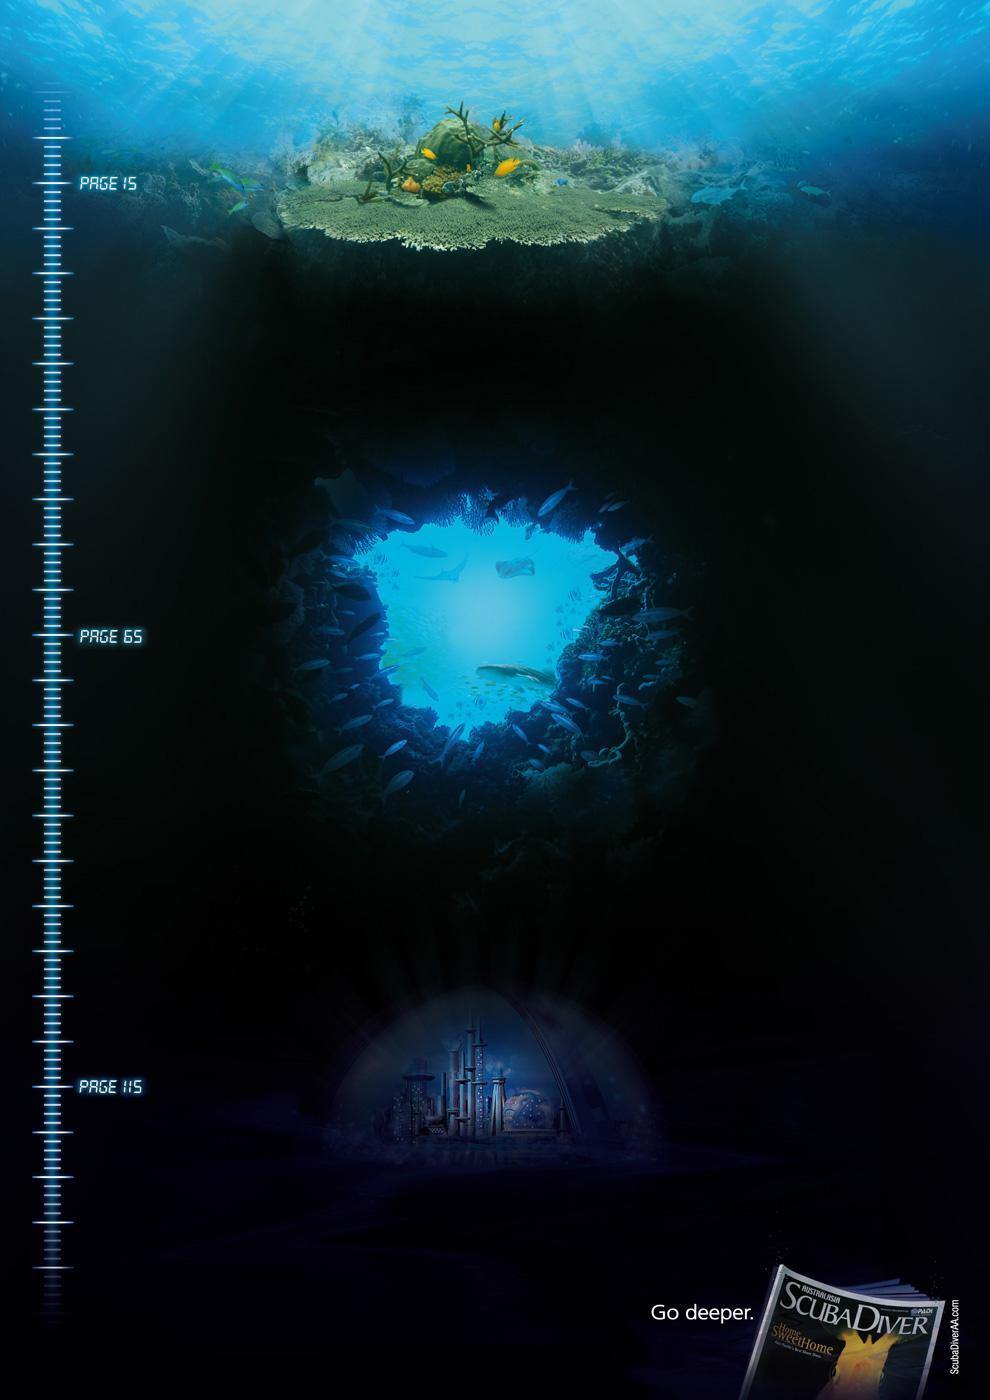 Scuba Diver Magazine Print Ad -  City of the Deep